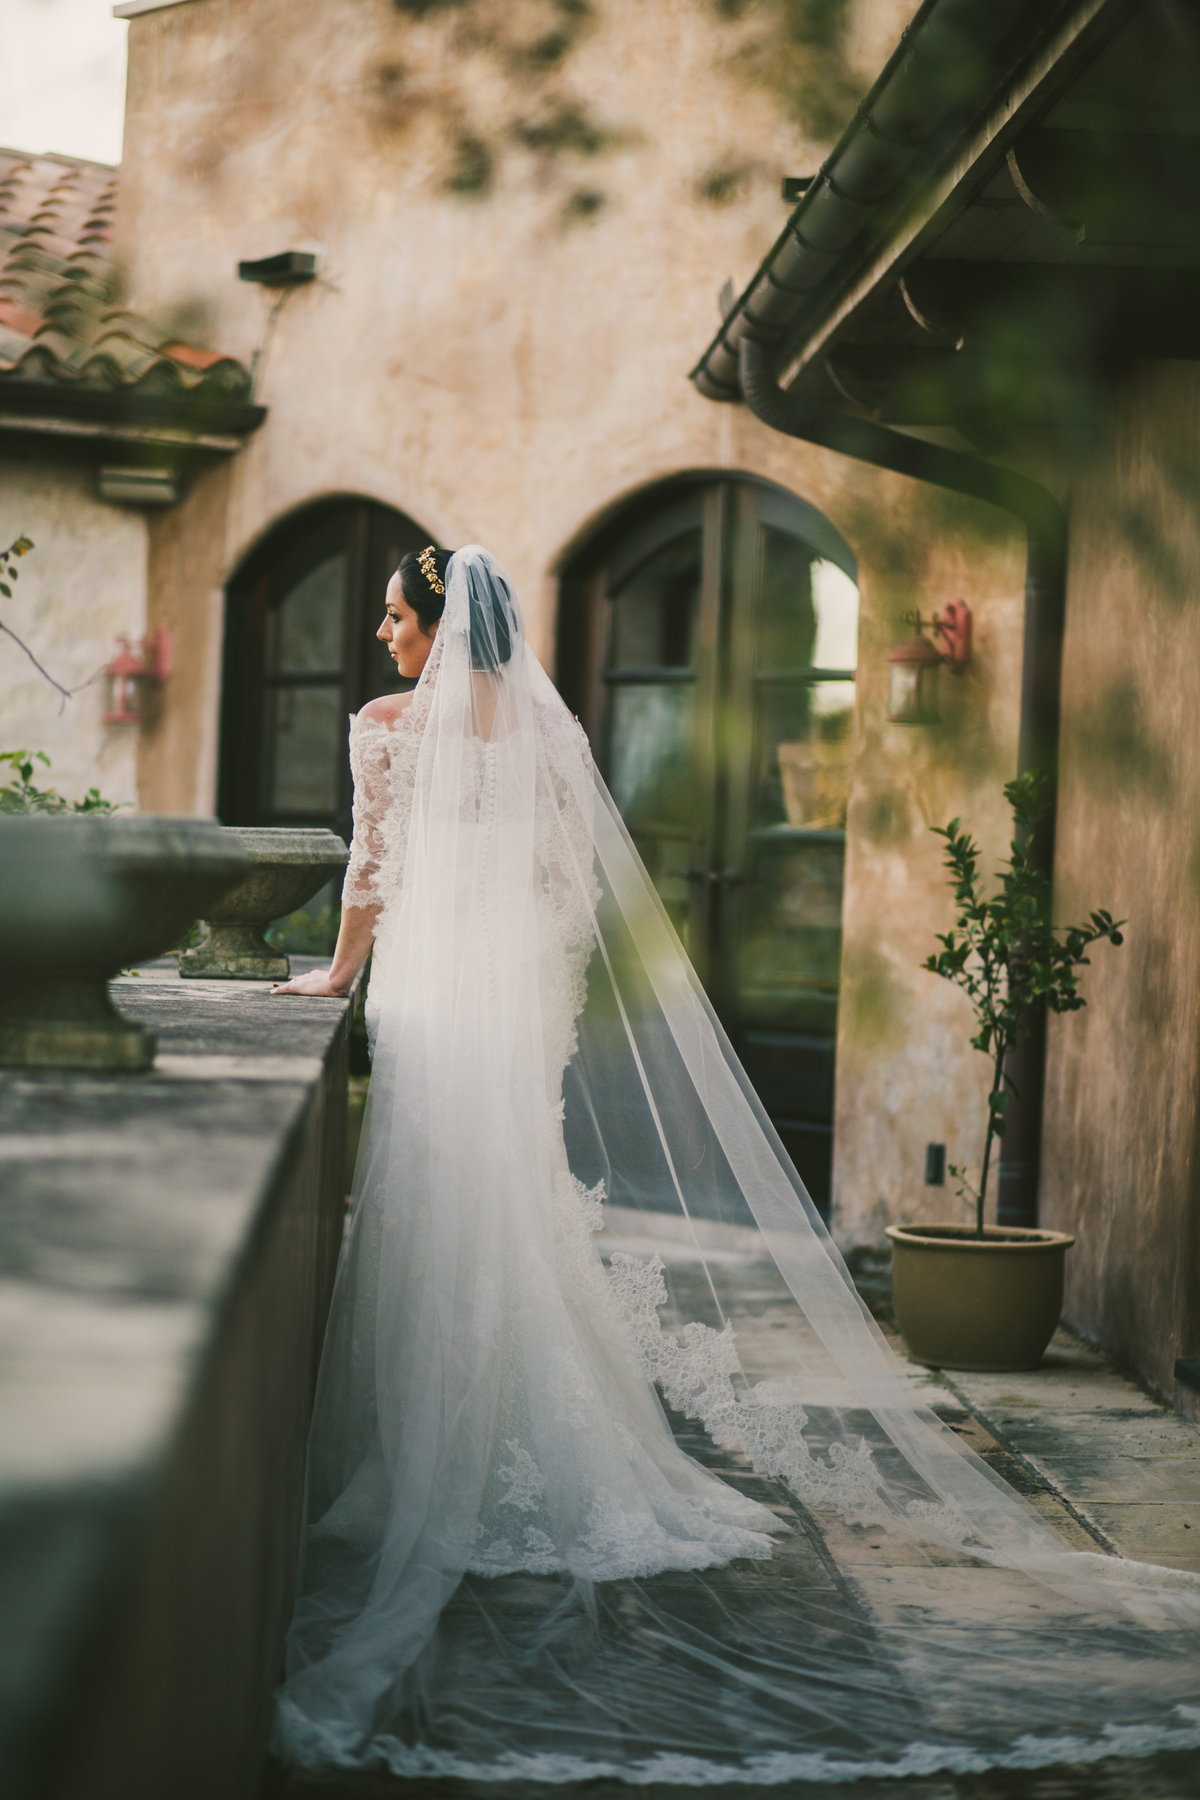 austin texas bridal portrait wedding photographer013.JPG